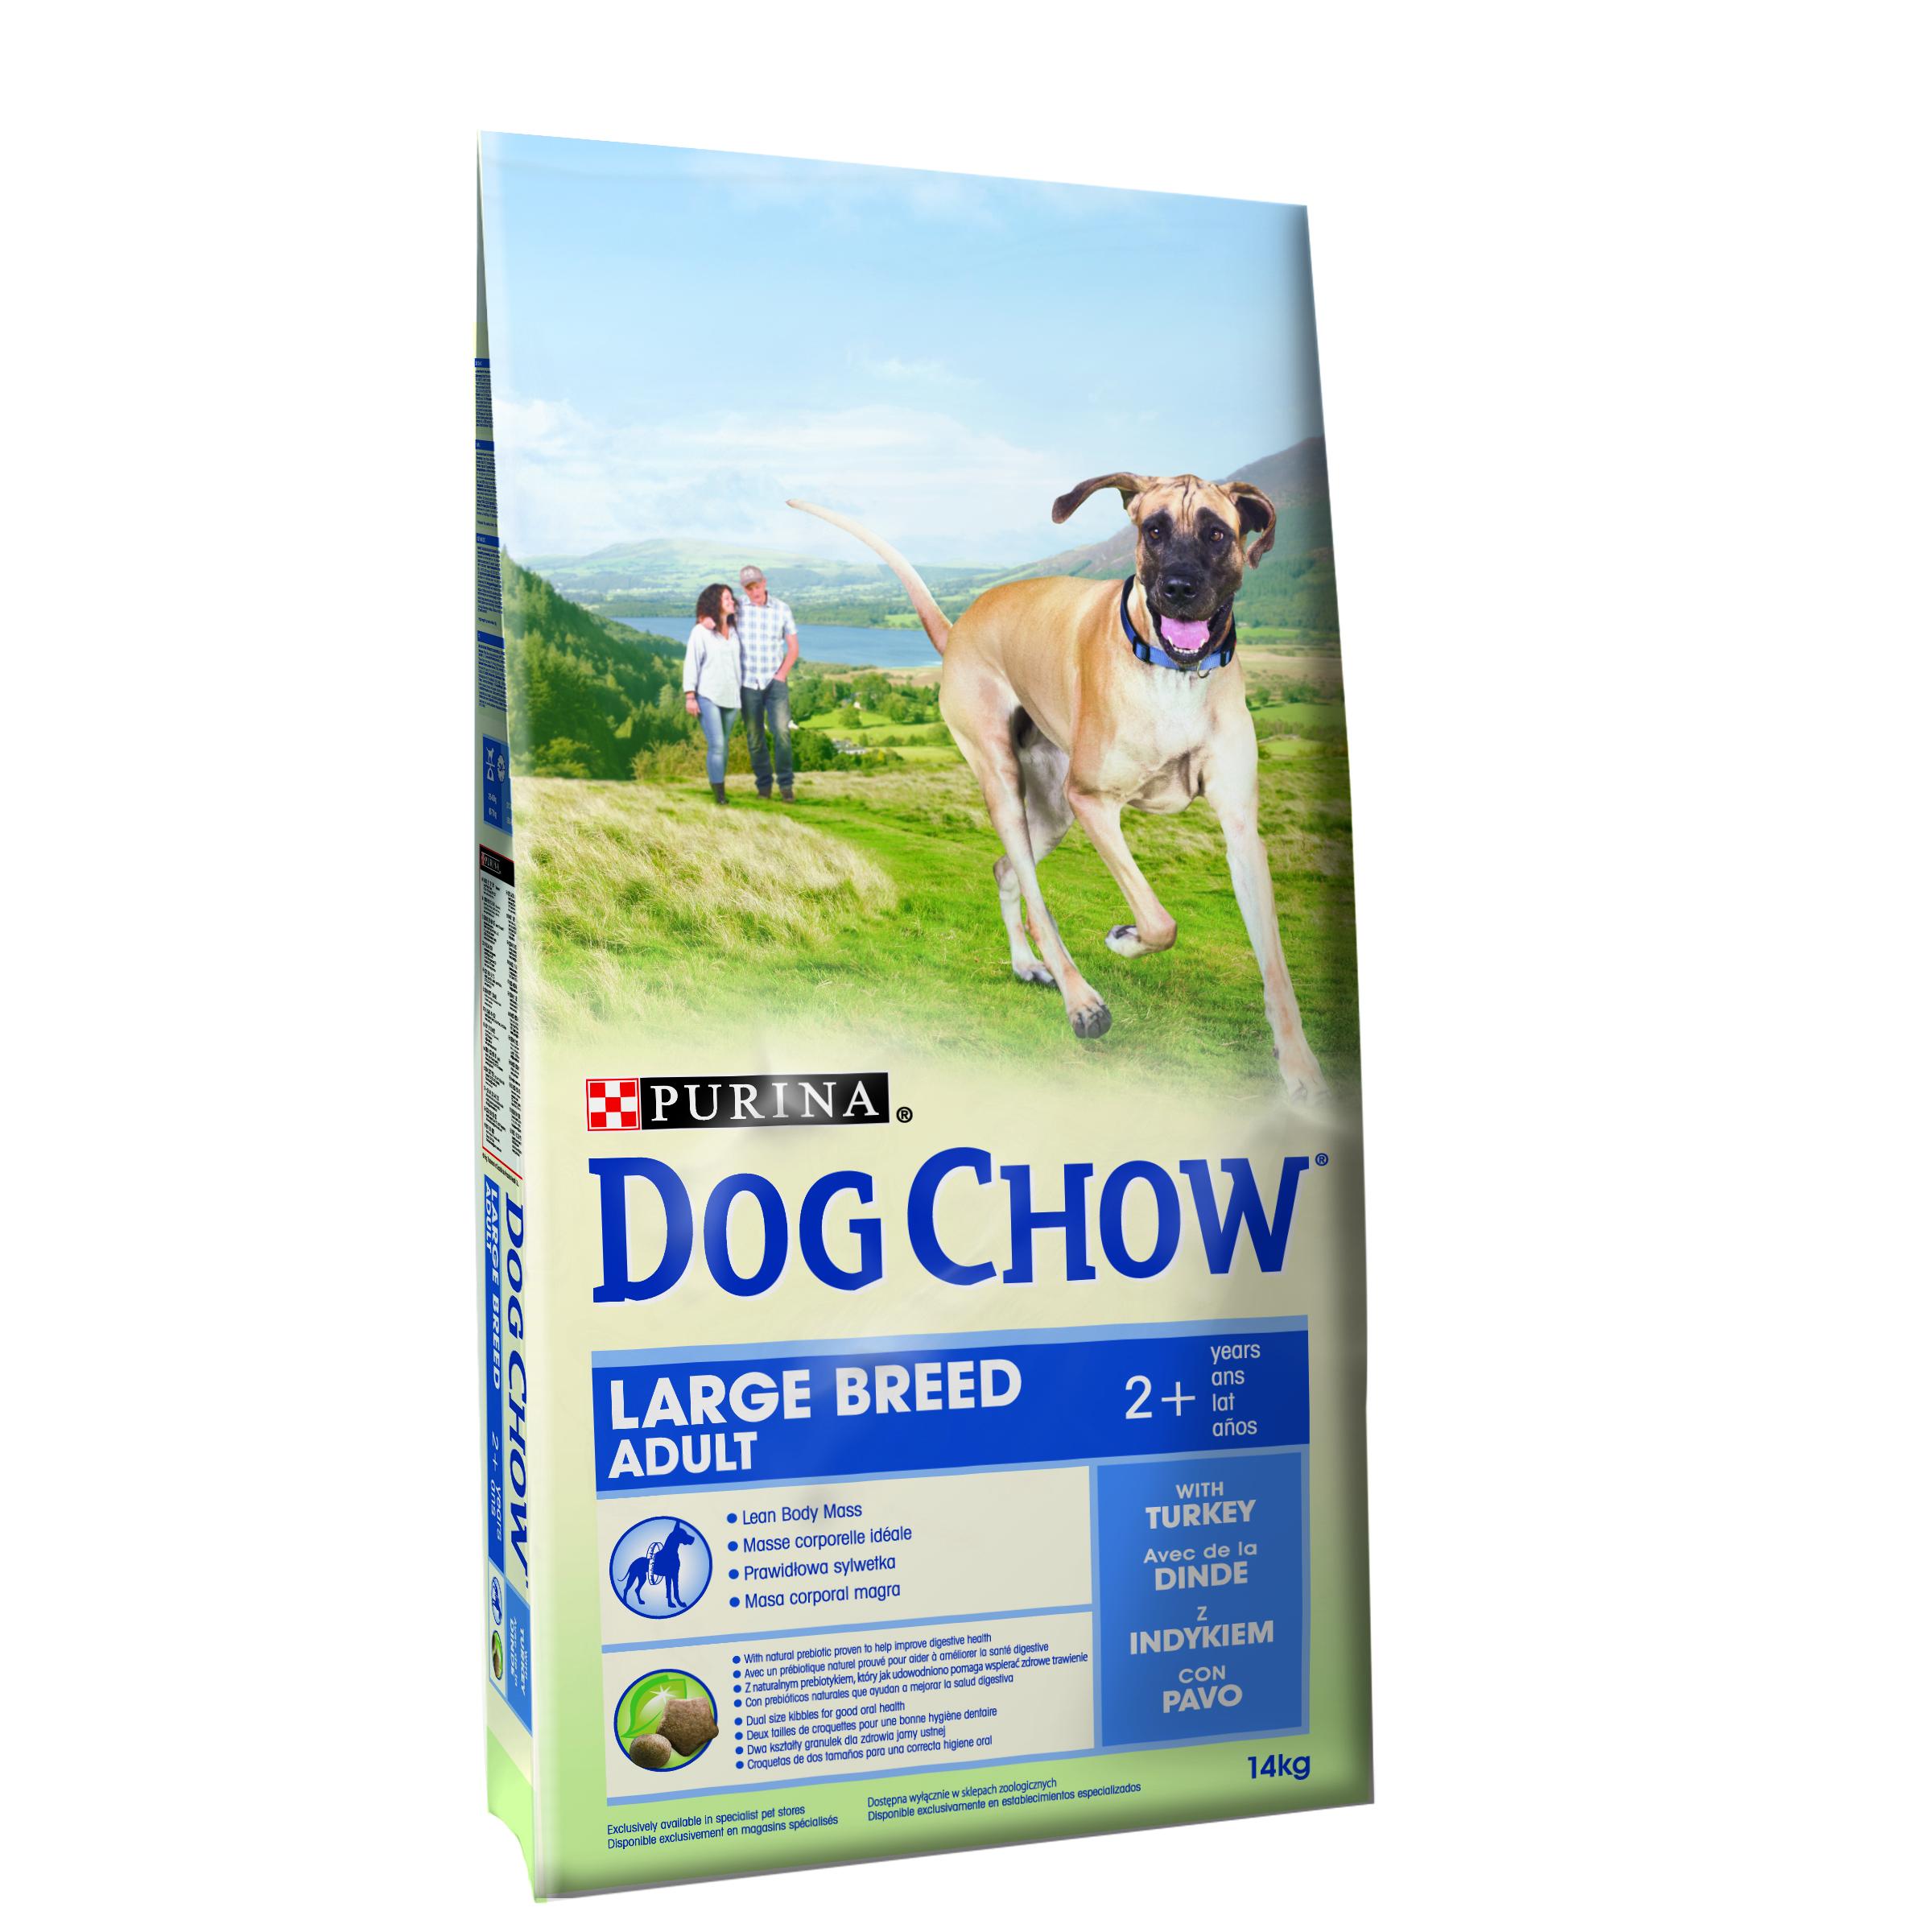 Purina Dog Chow Adult Large Breed Turkey 14 Kg